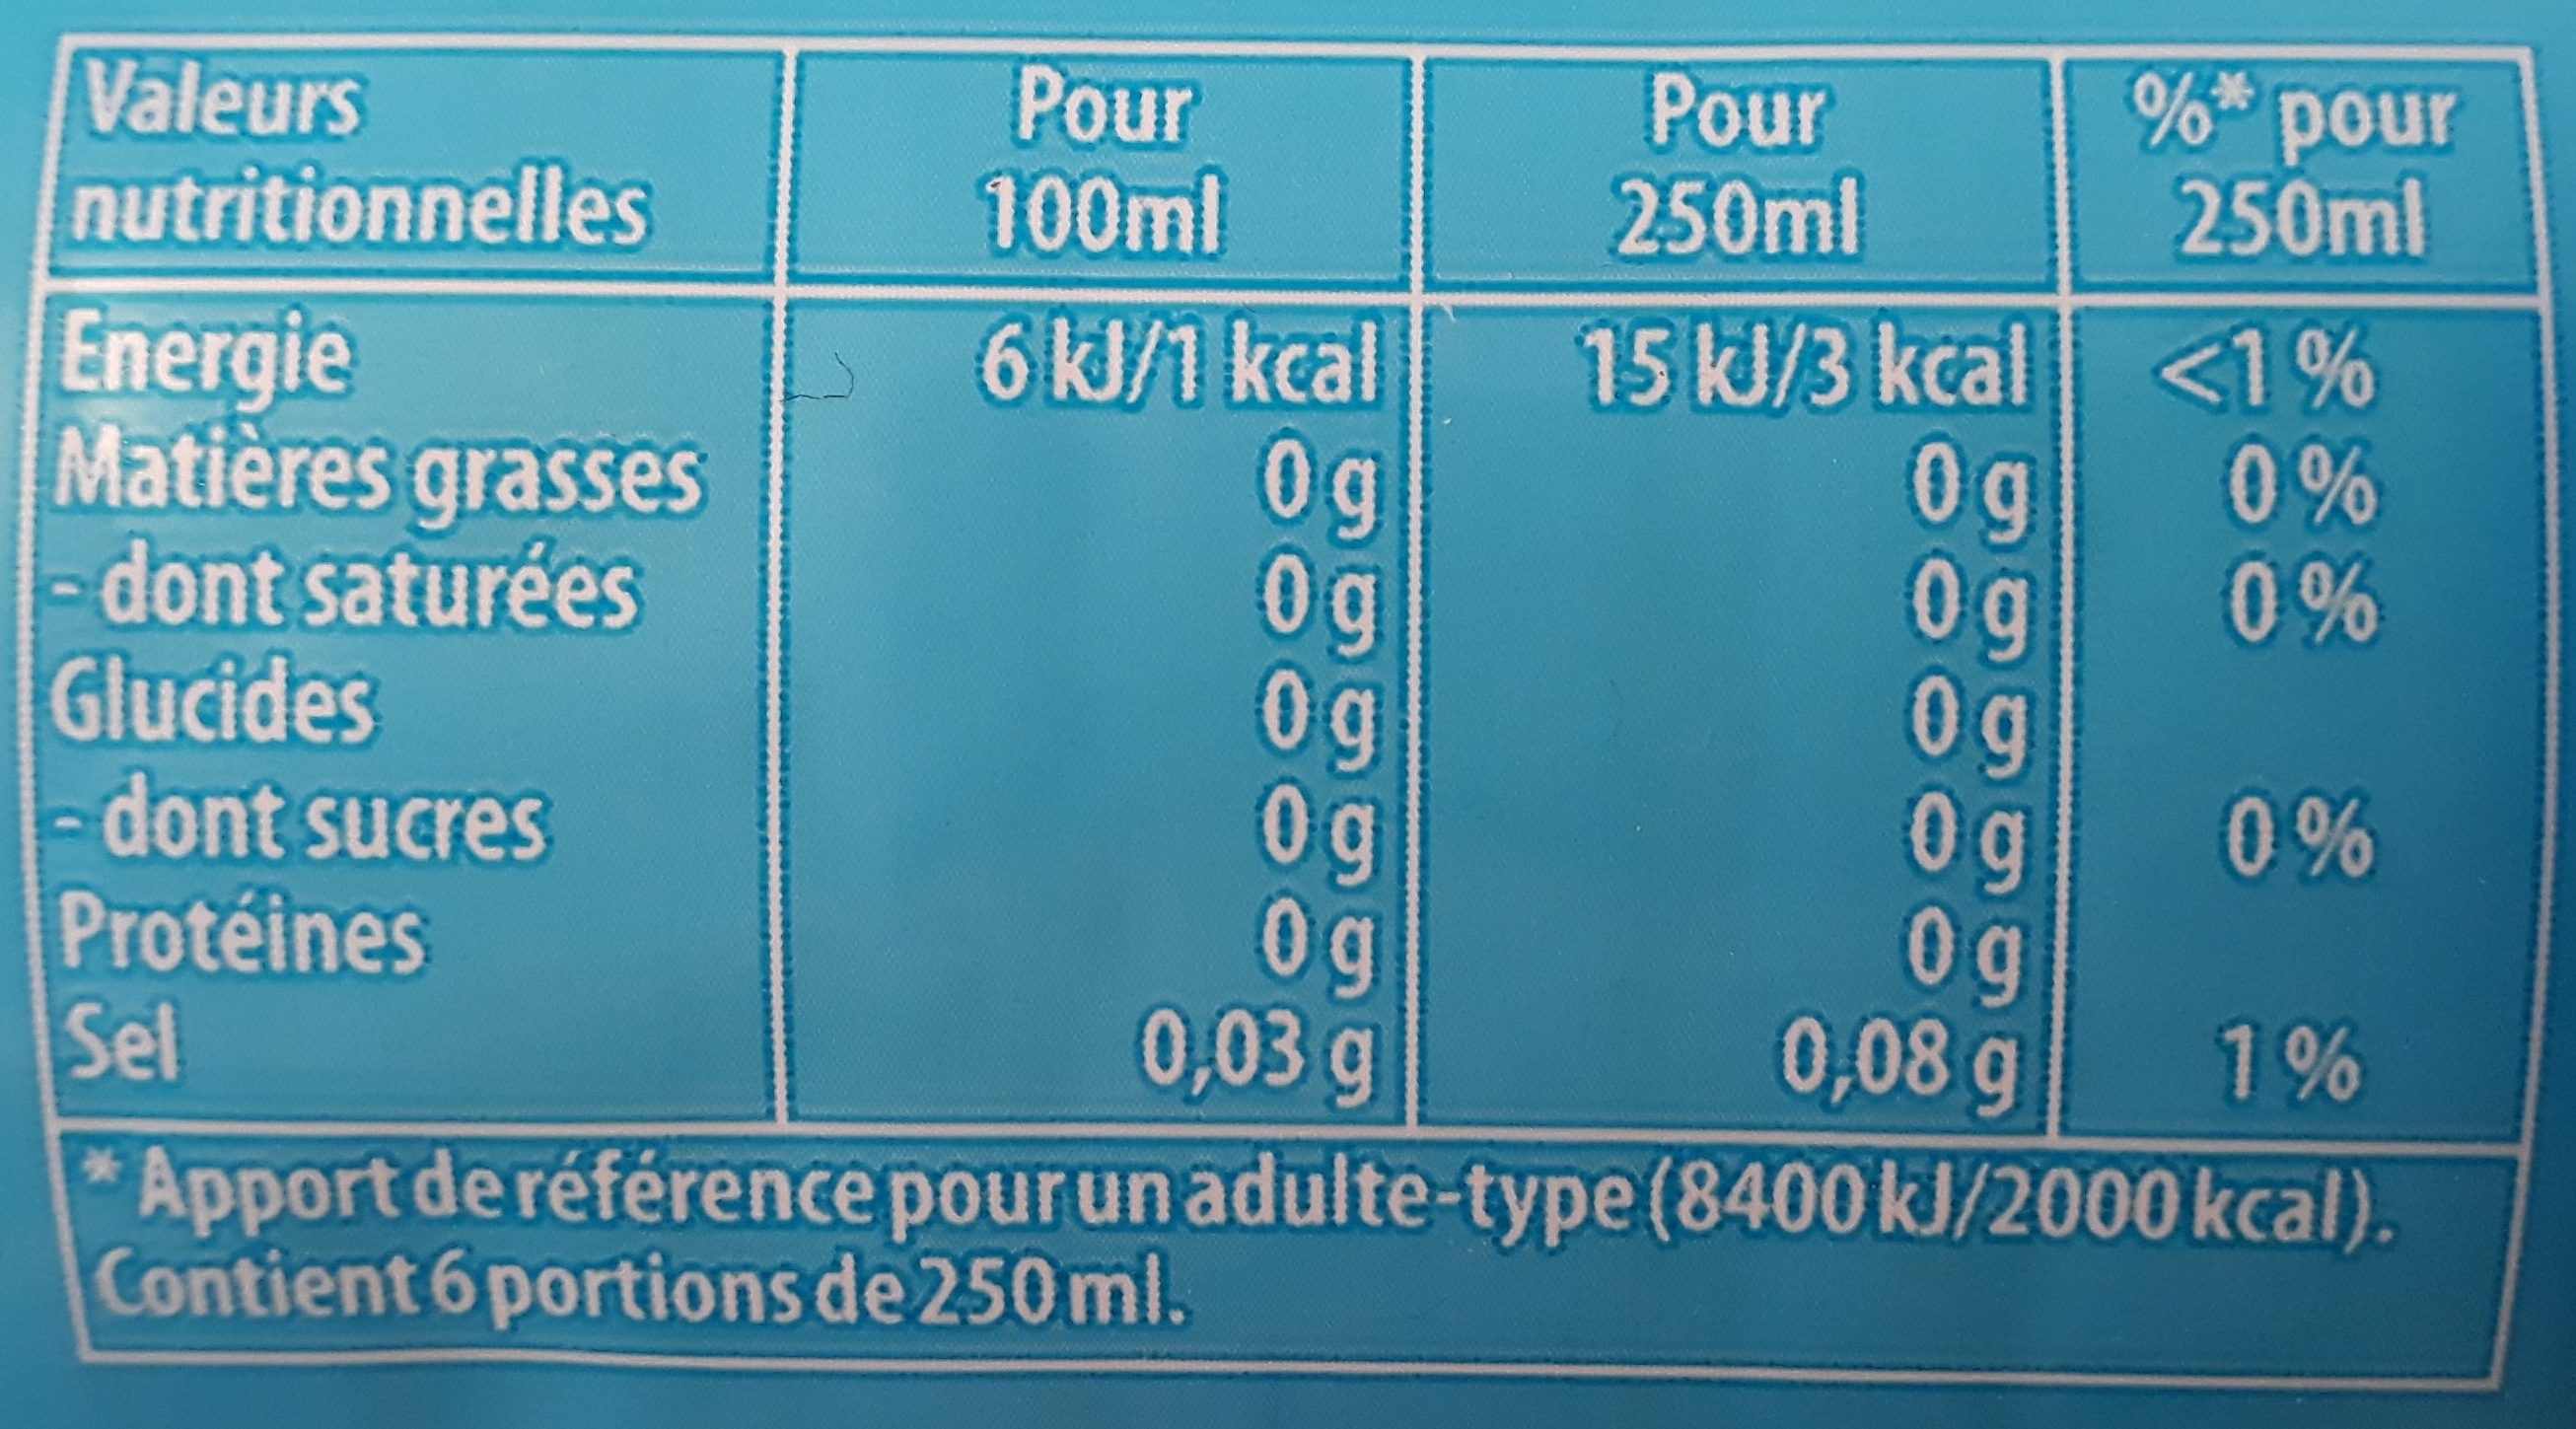 Lipton ice tea pêche zéro sucres - Voedingswaarden